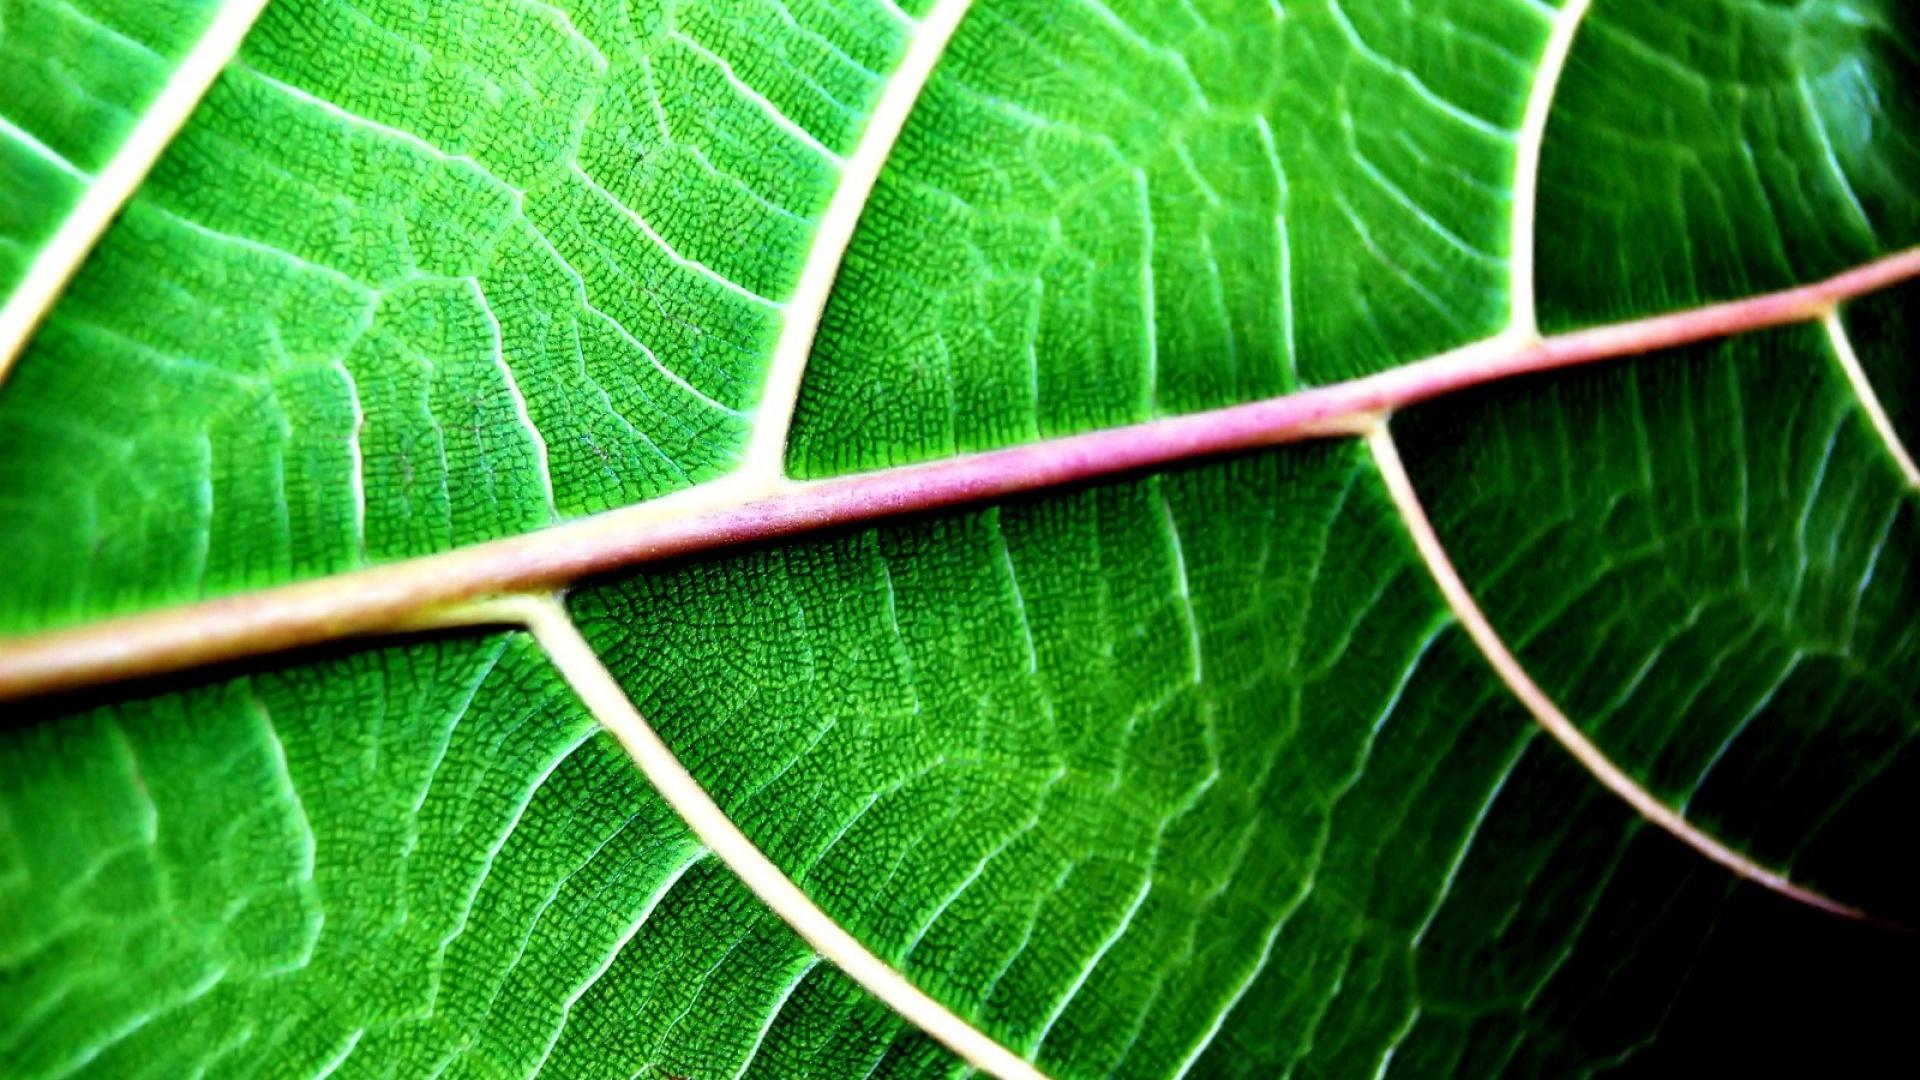 Fond d 39 ecran chlorophylle zoom wallpaper for Espace chlorophylle